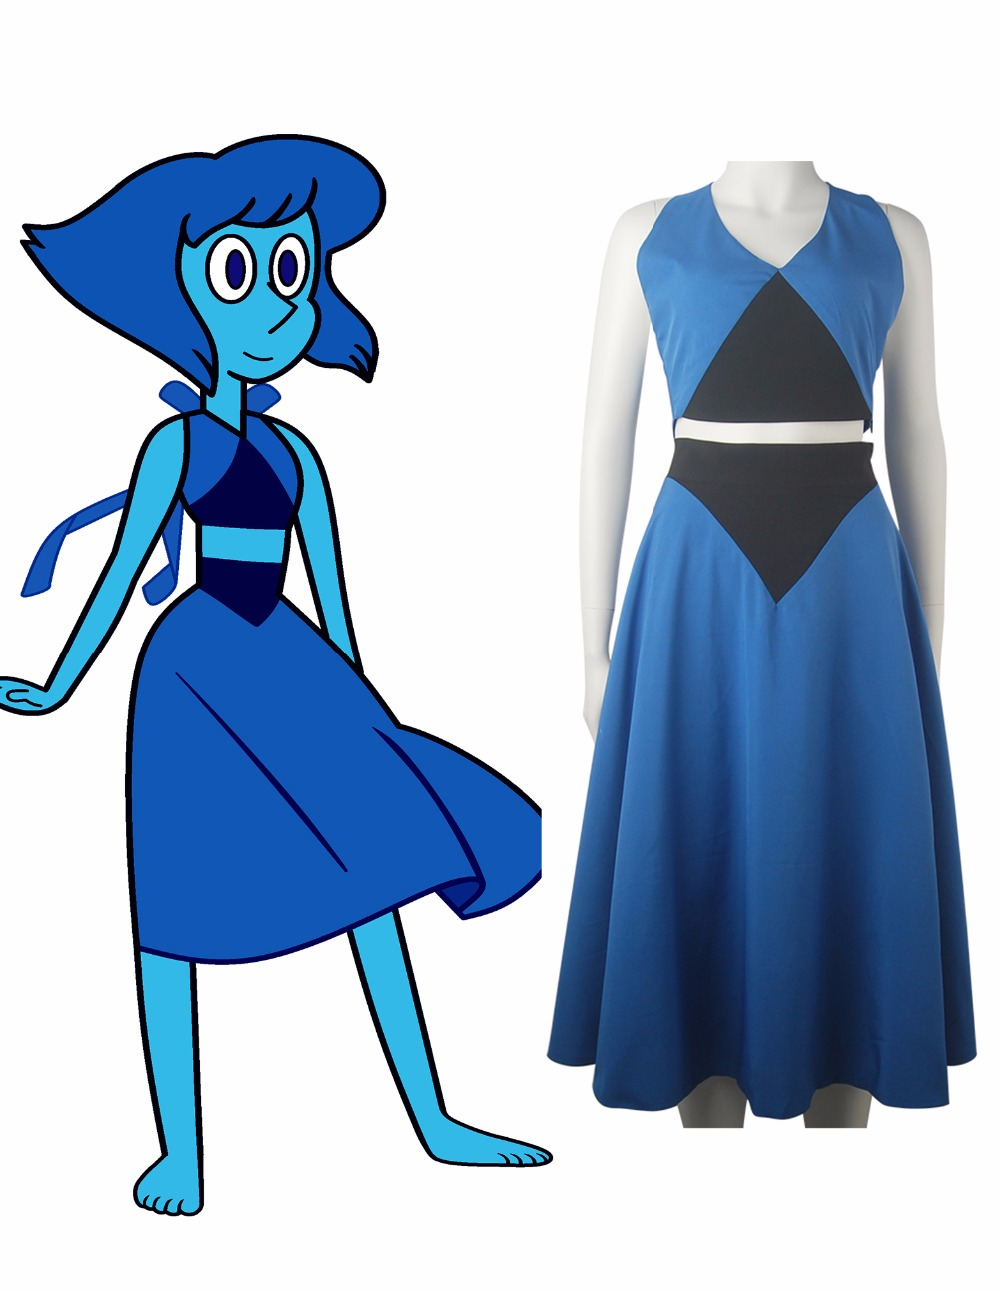 Steven Universo Lapislázuli vestido azul diario desgaste de - Disfraces